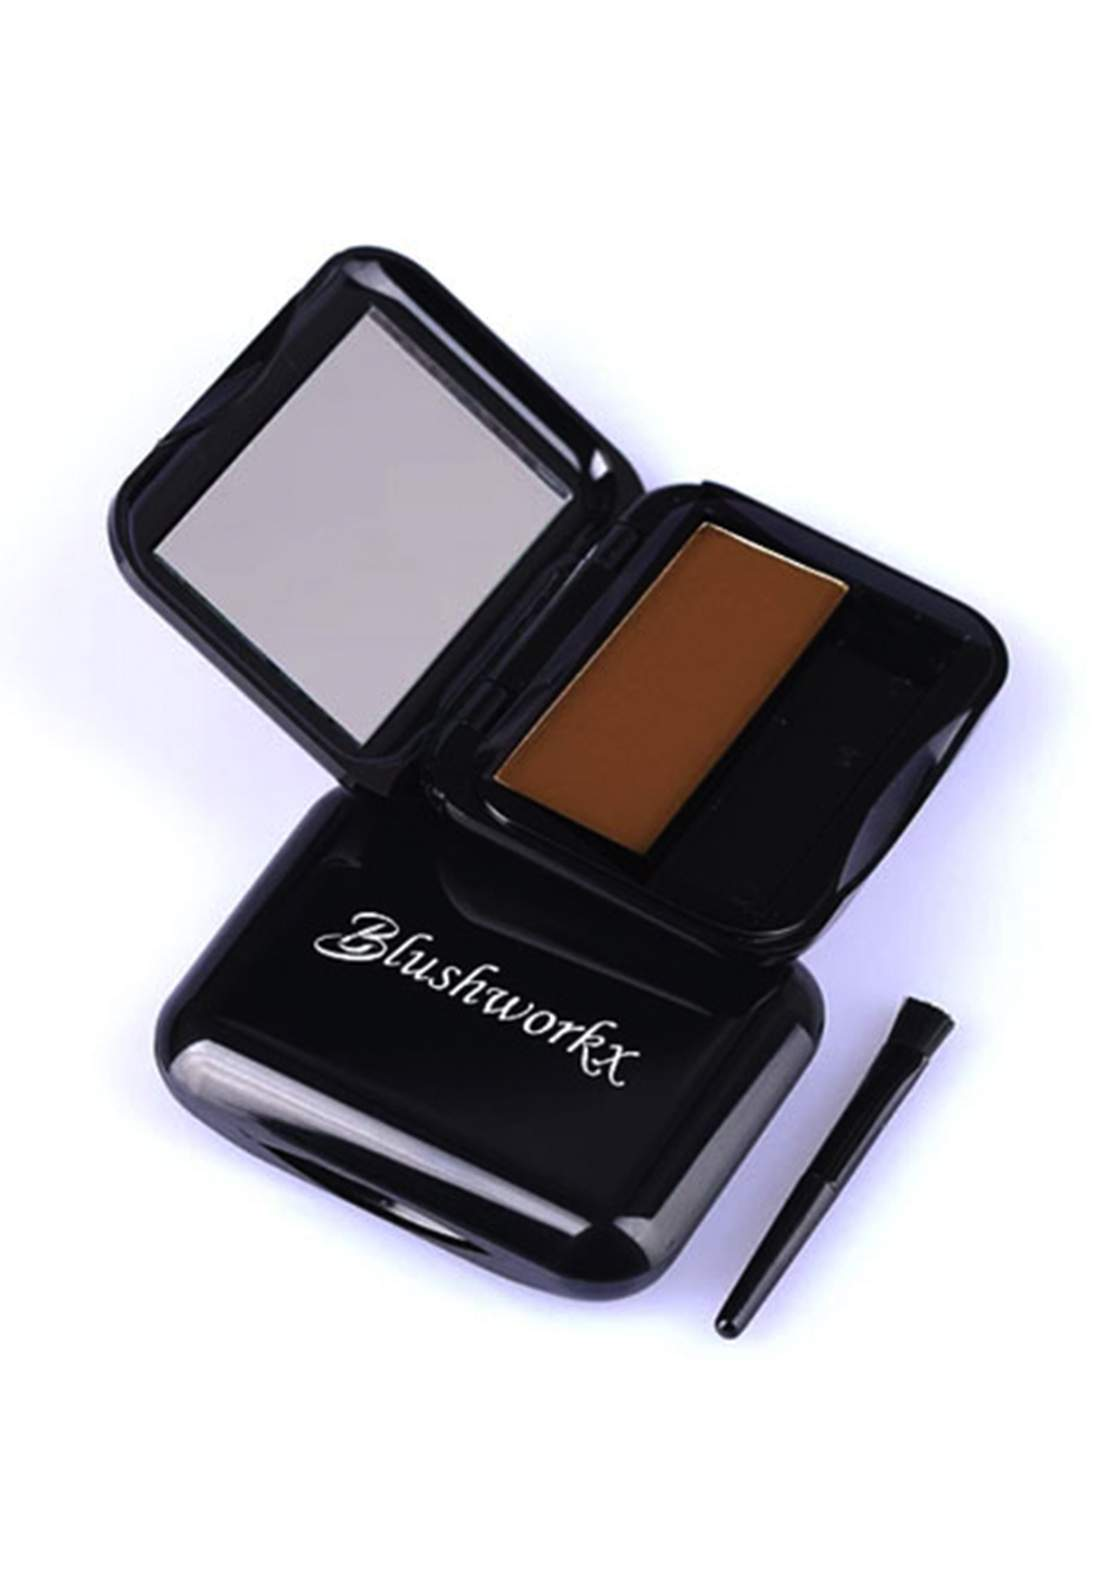 Blushworkx Hollywood Brush -A- Brow 3.1g Light Brown شدو حواجب